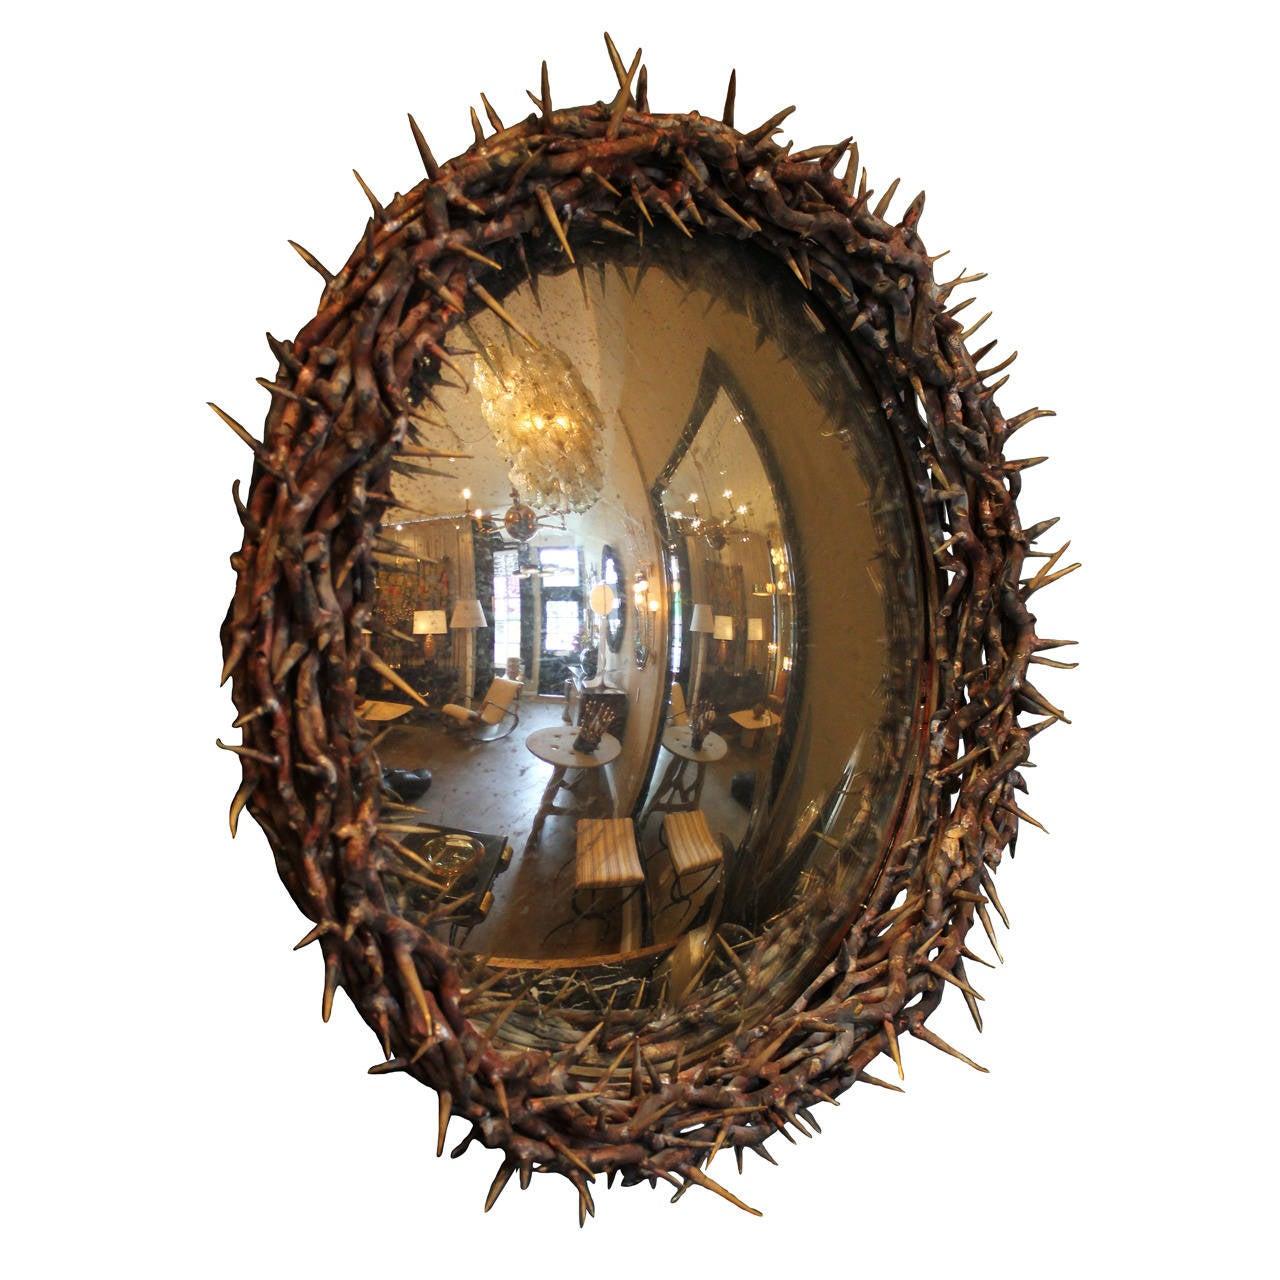 Large Onik Agaronyan Convex Crown of Thorns Mirror